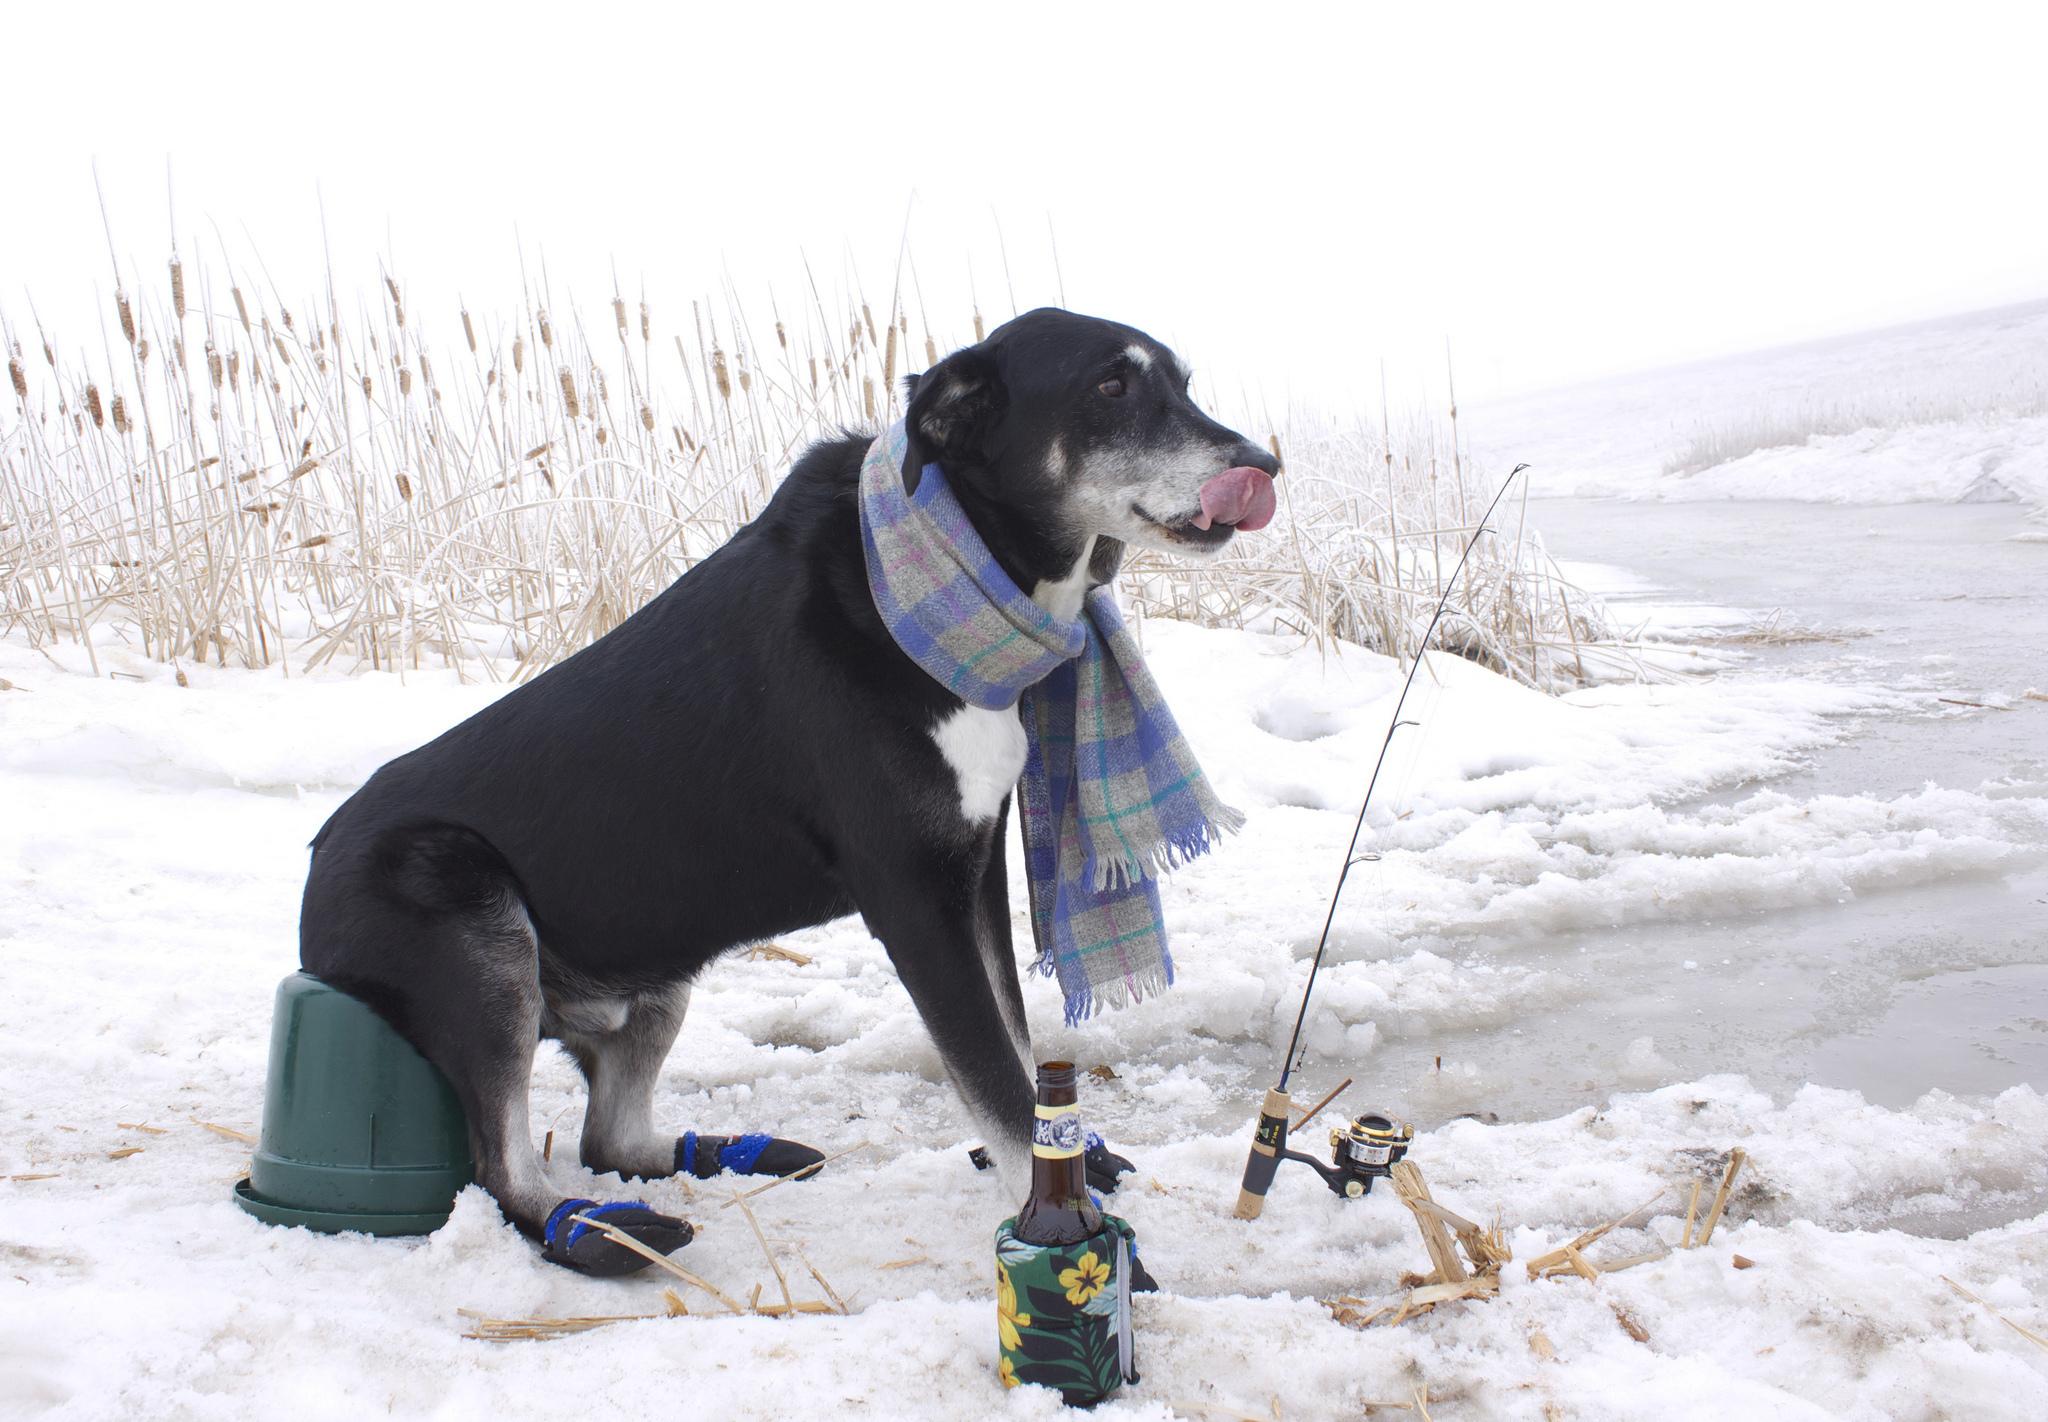 Готовим удочки летом! Ловим рыбу зимой!